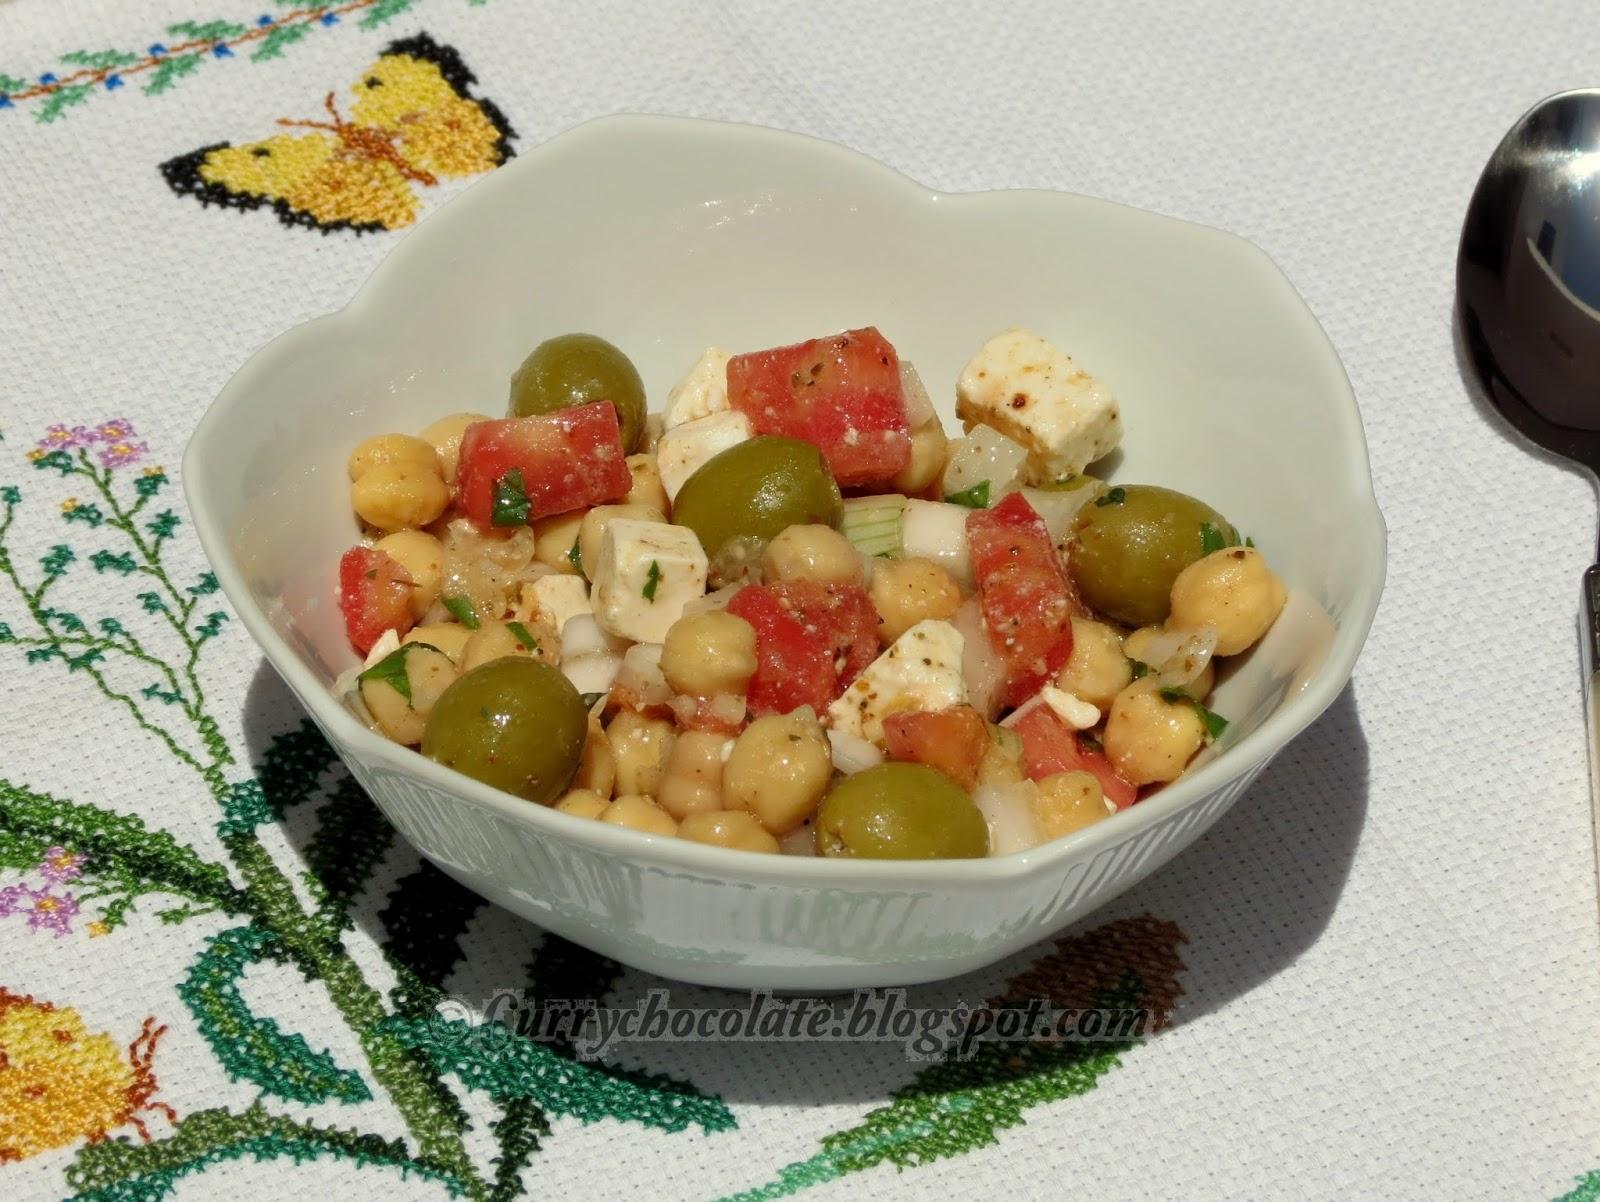 Nohut Salatasi - Ensalada turca de garbanzos - Turkish chickpea salad